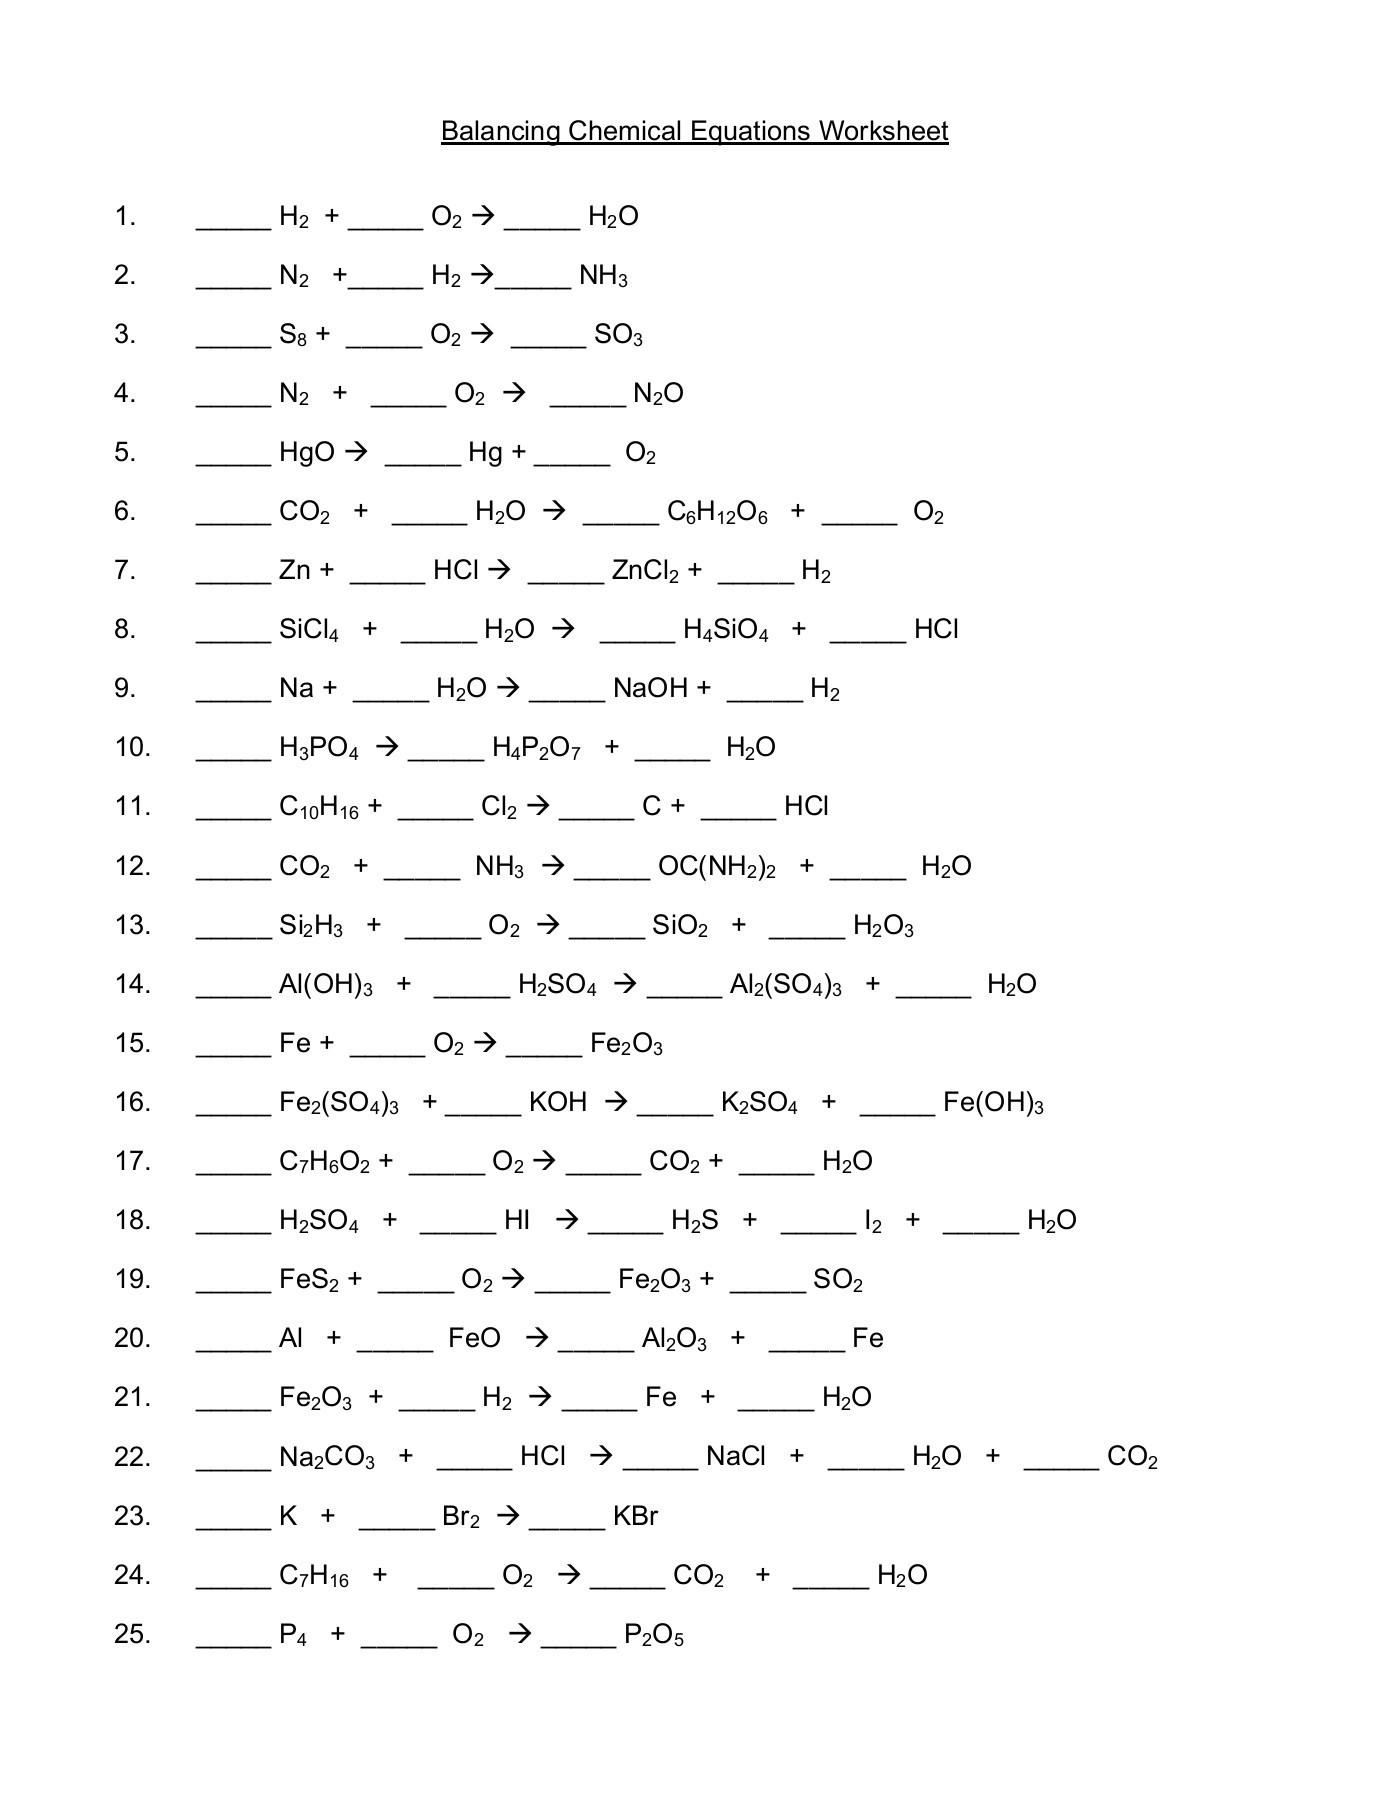 Balancing Chemical Equations Worksheet O Æ H O — db excel.com